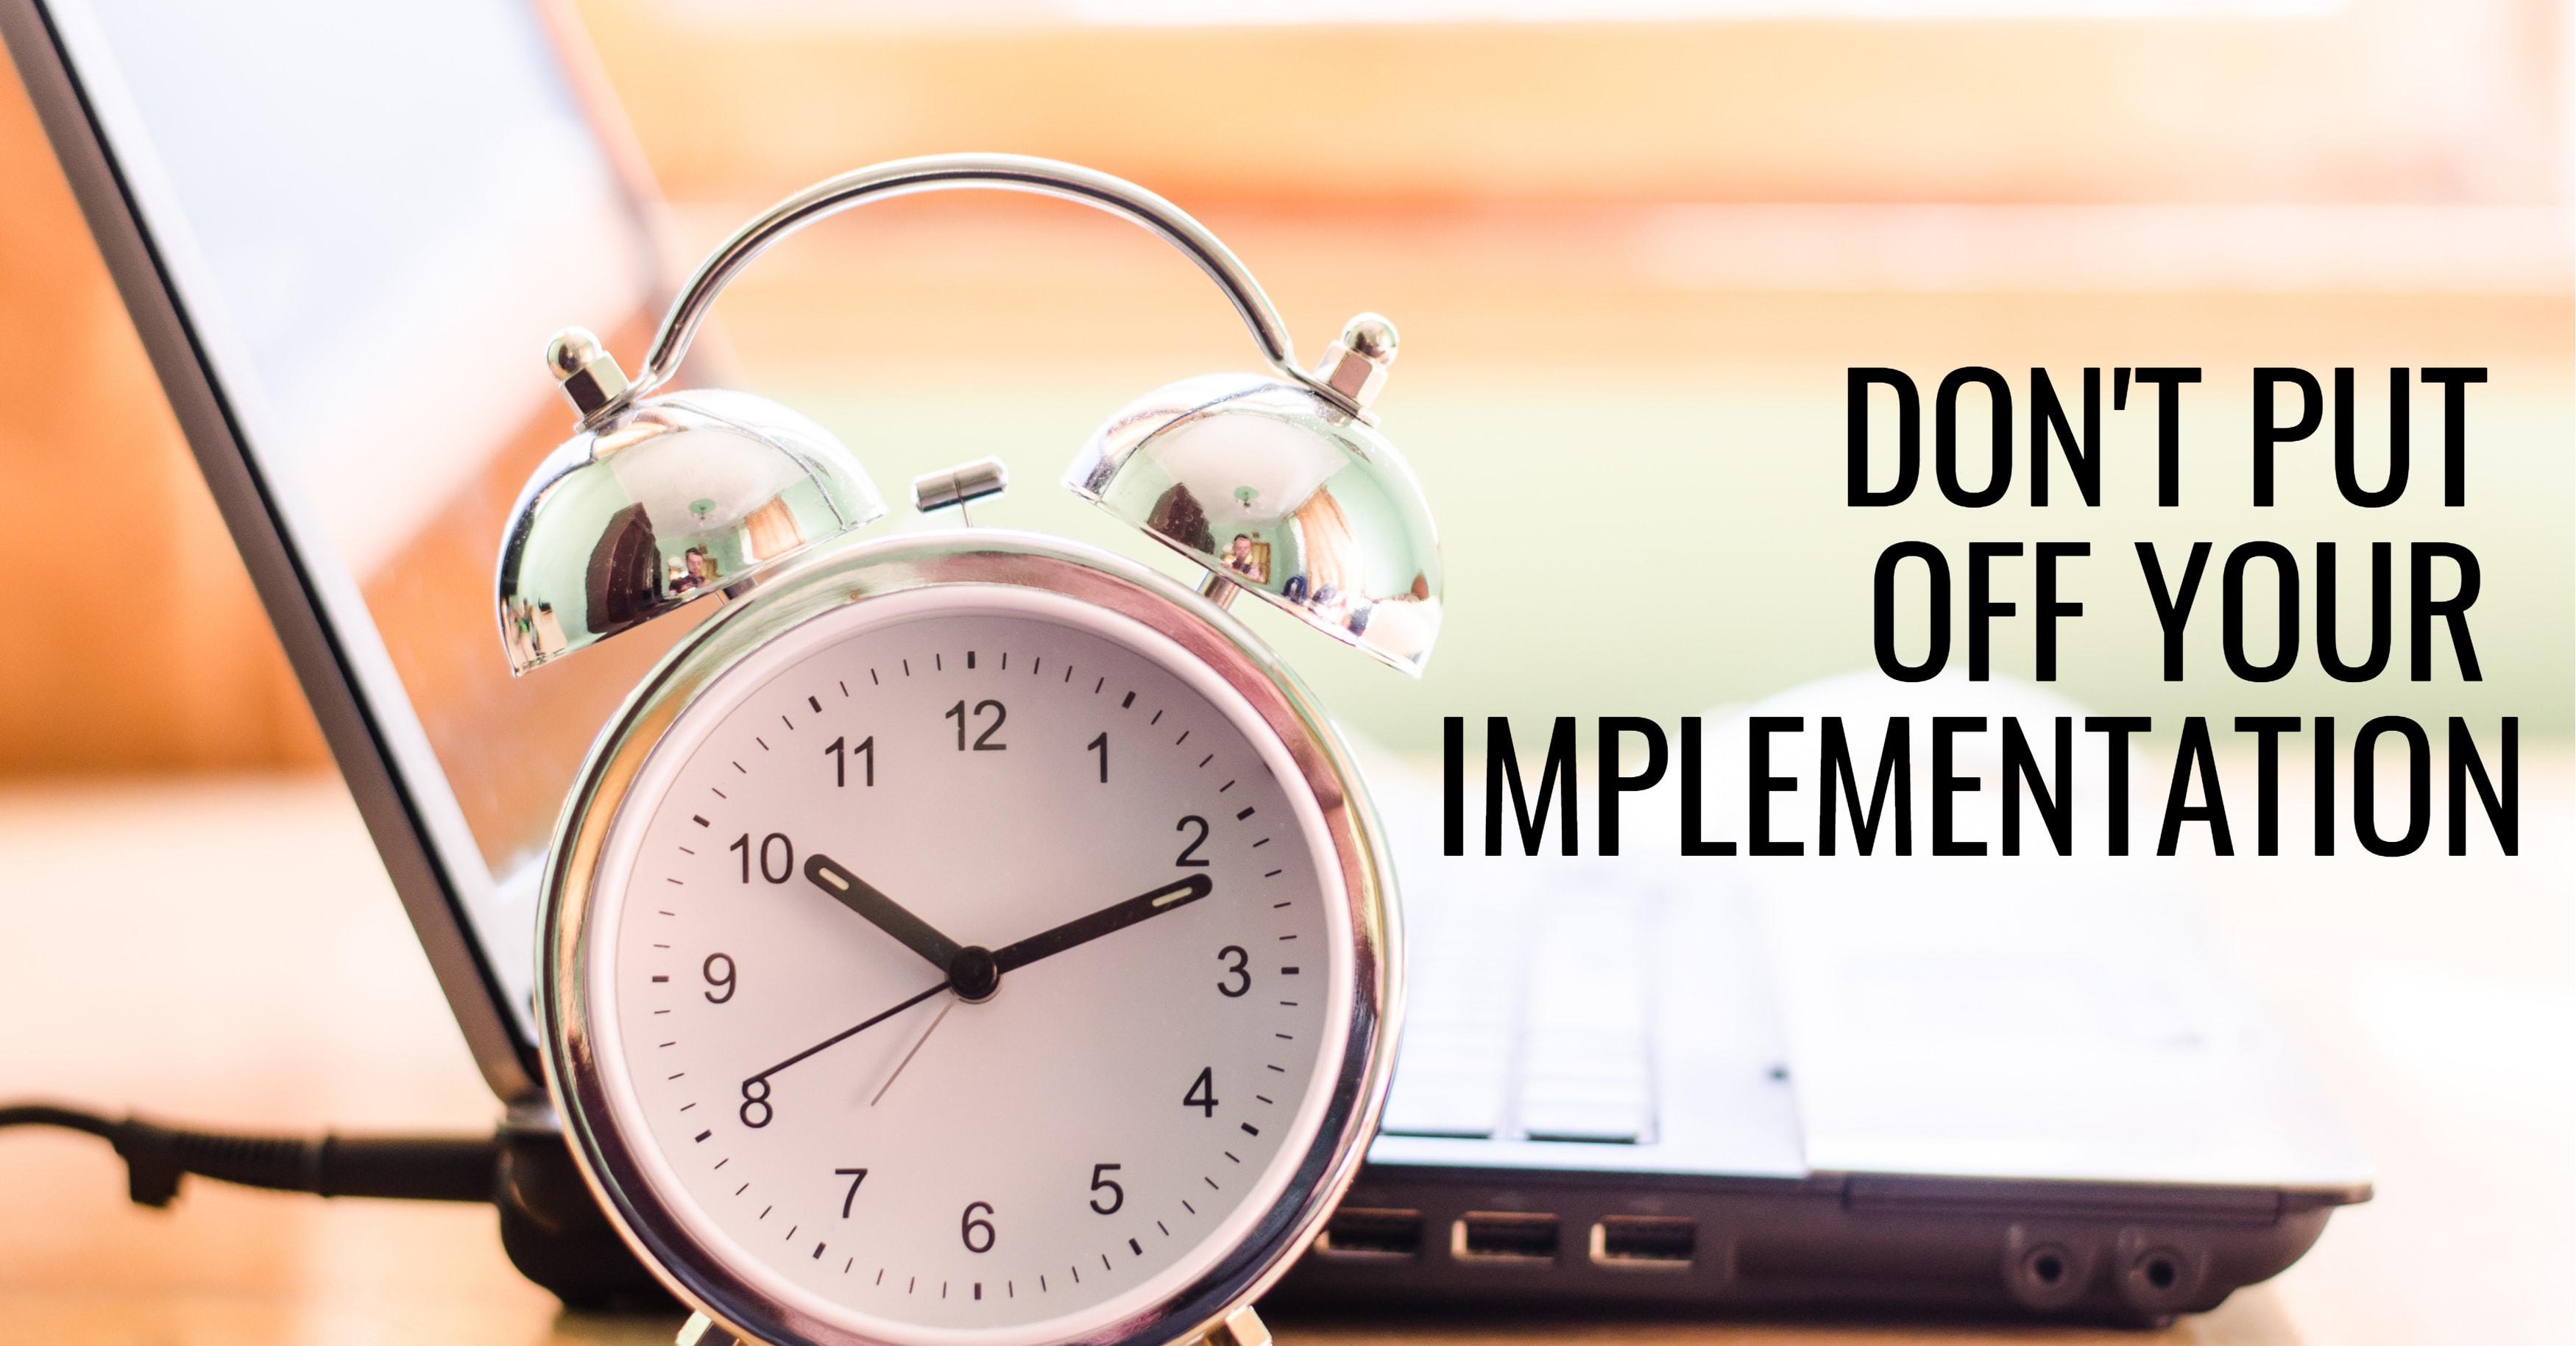 Put Off Epicor ERP Implementation